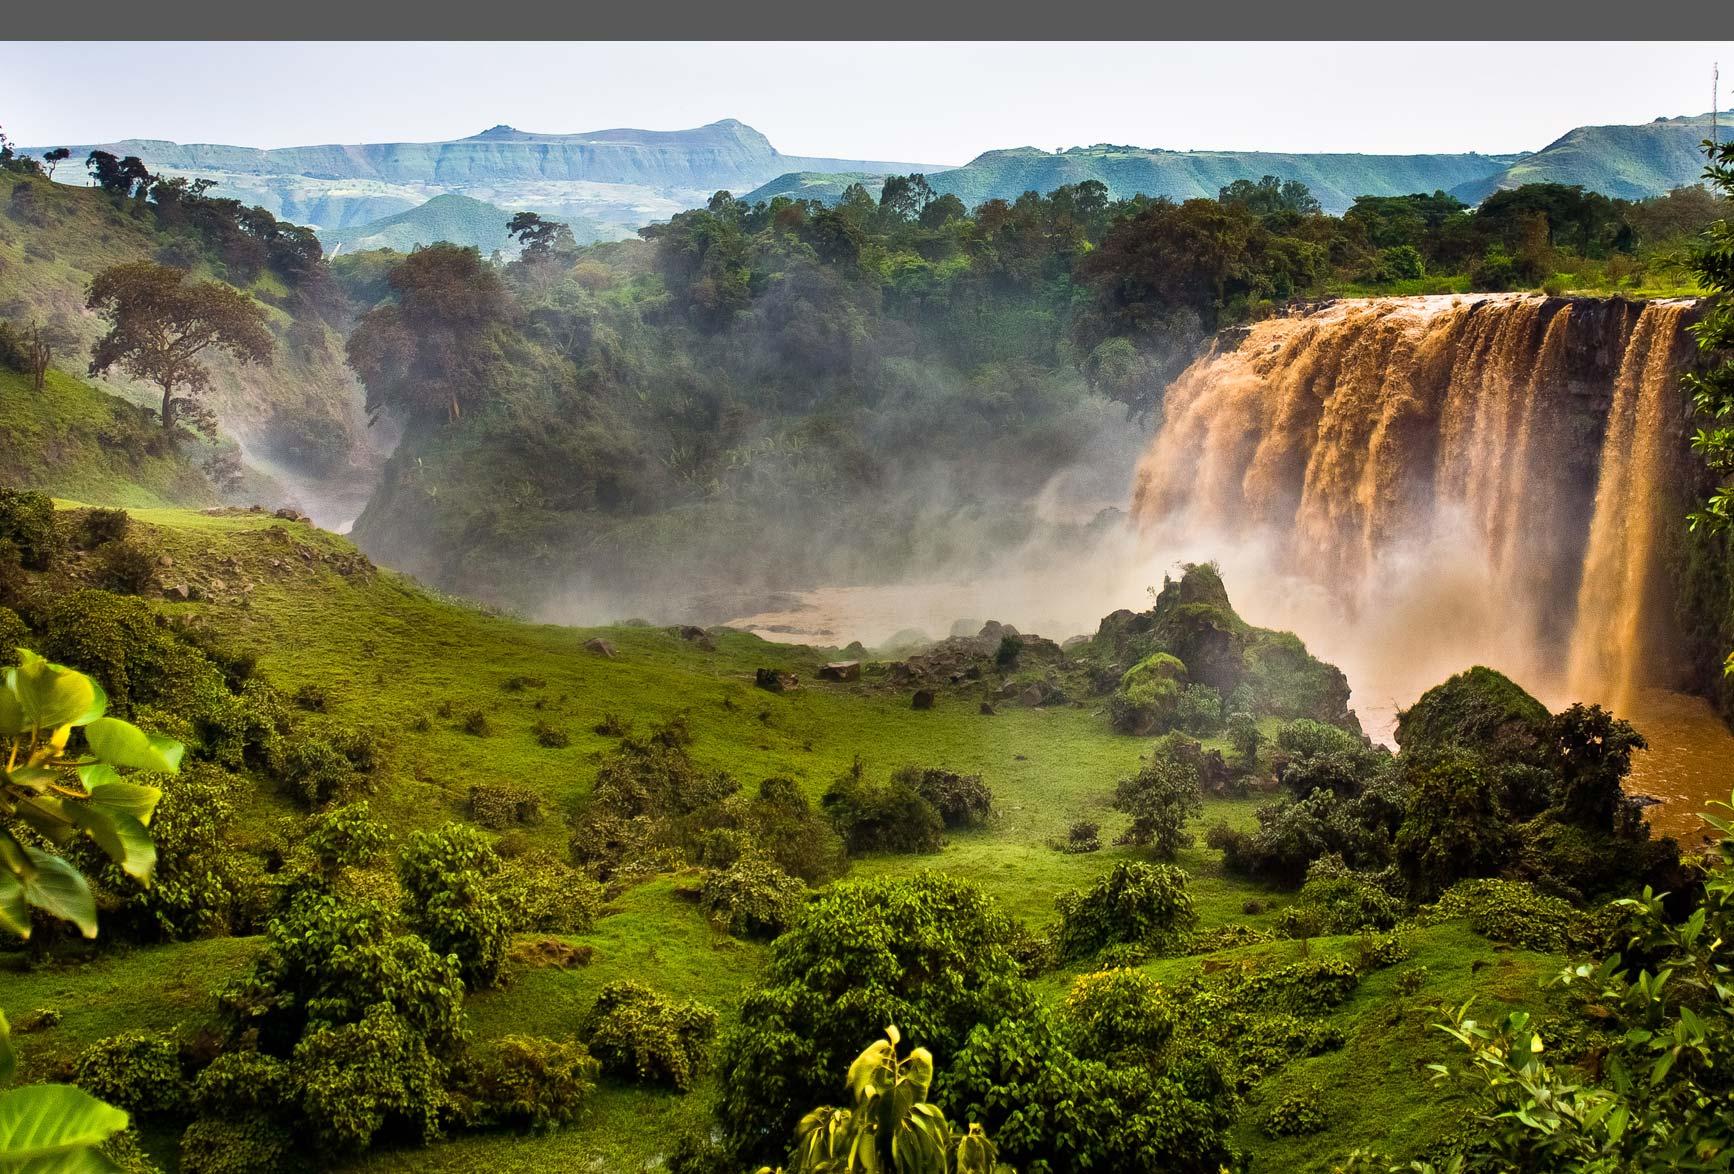 20180221112547-viaje-terres-tour-operador-etiopia001.jpg